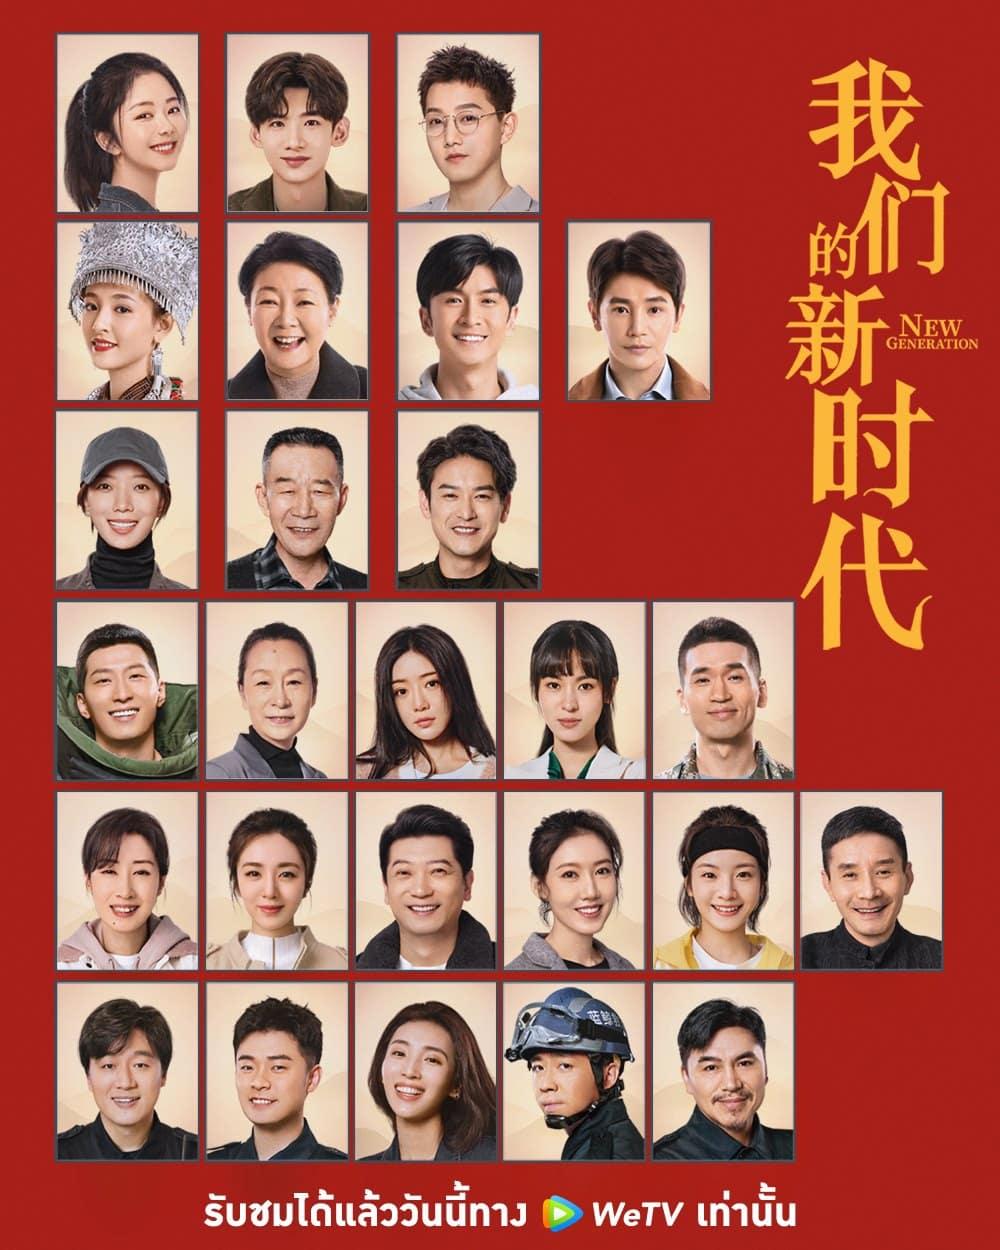 New Generation (2021) ยุคใหม่ของพวกเรา ซับไทย EP1-EP10